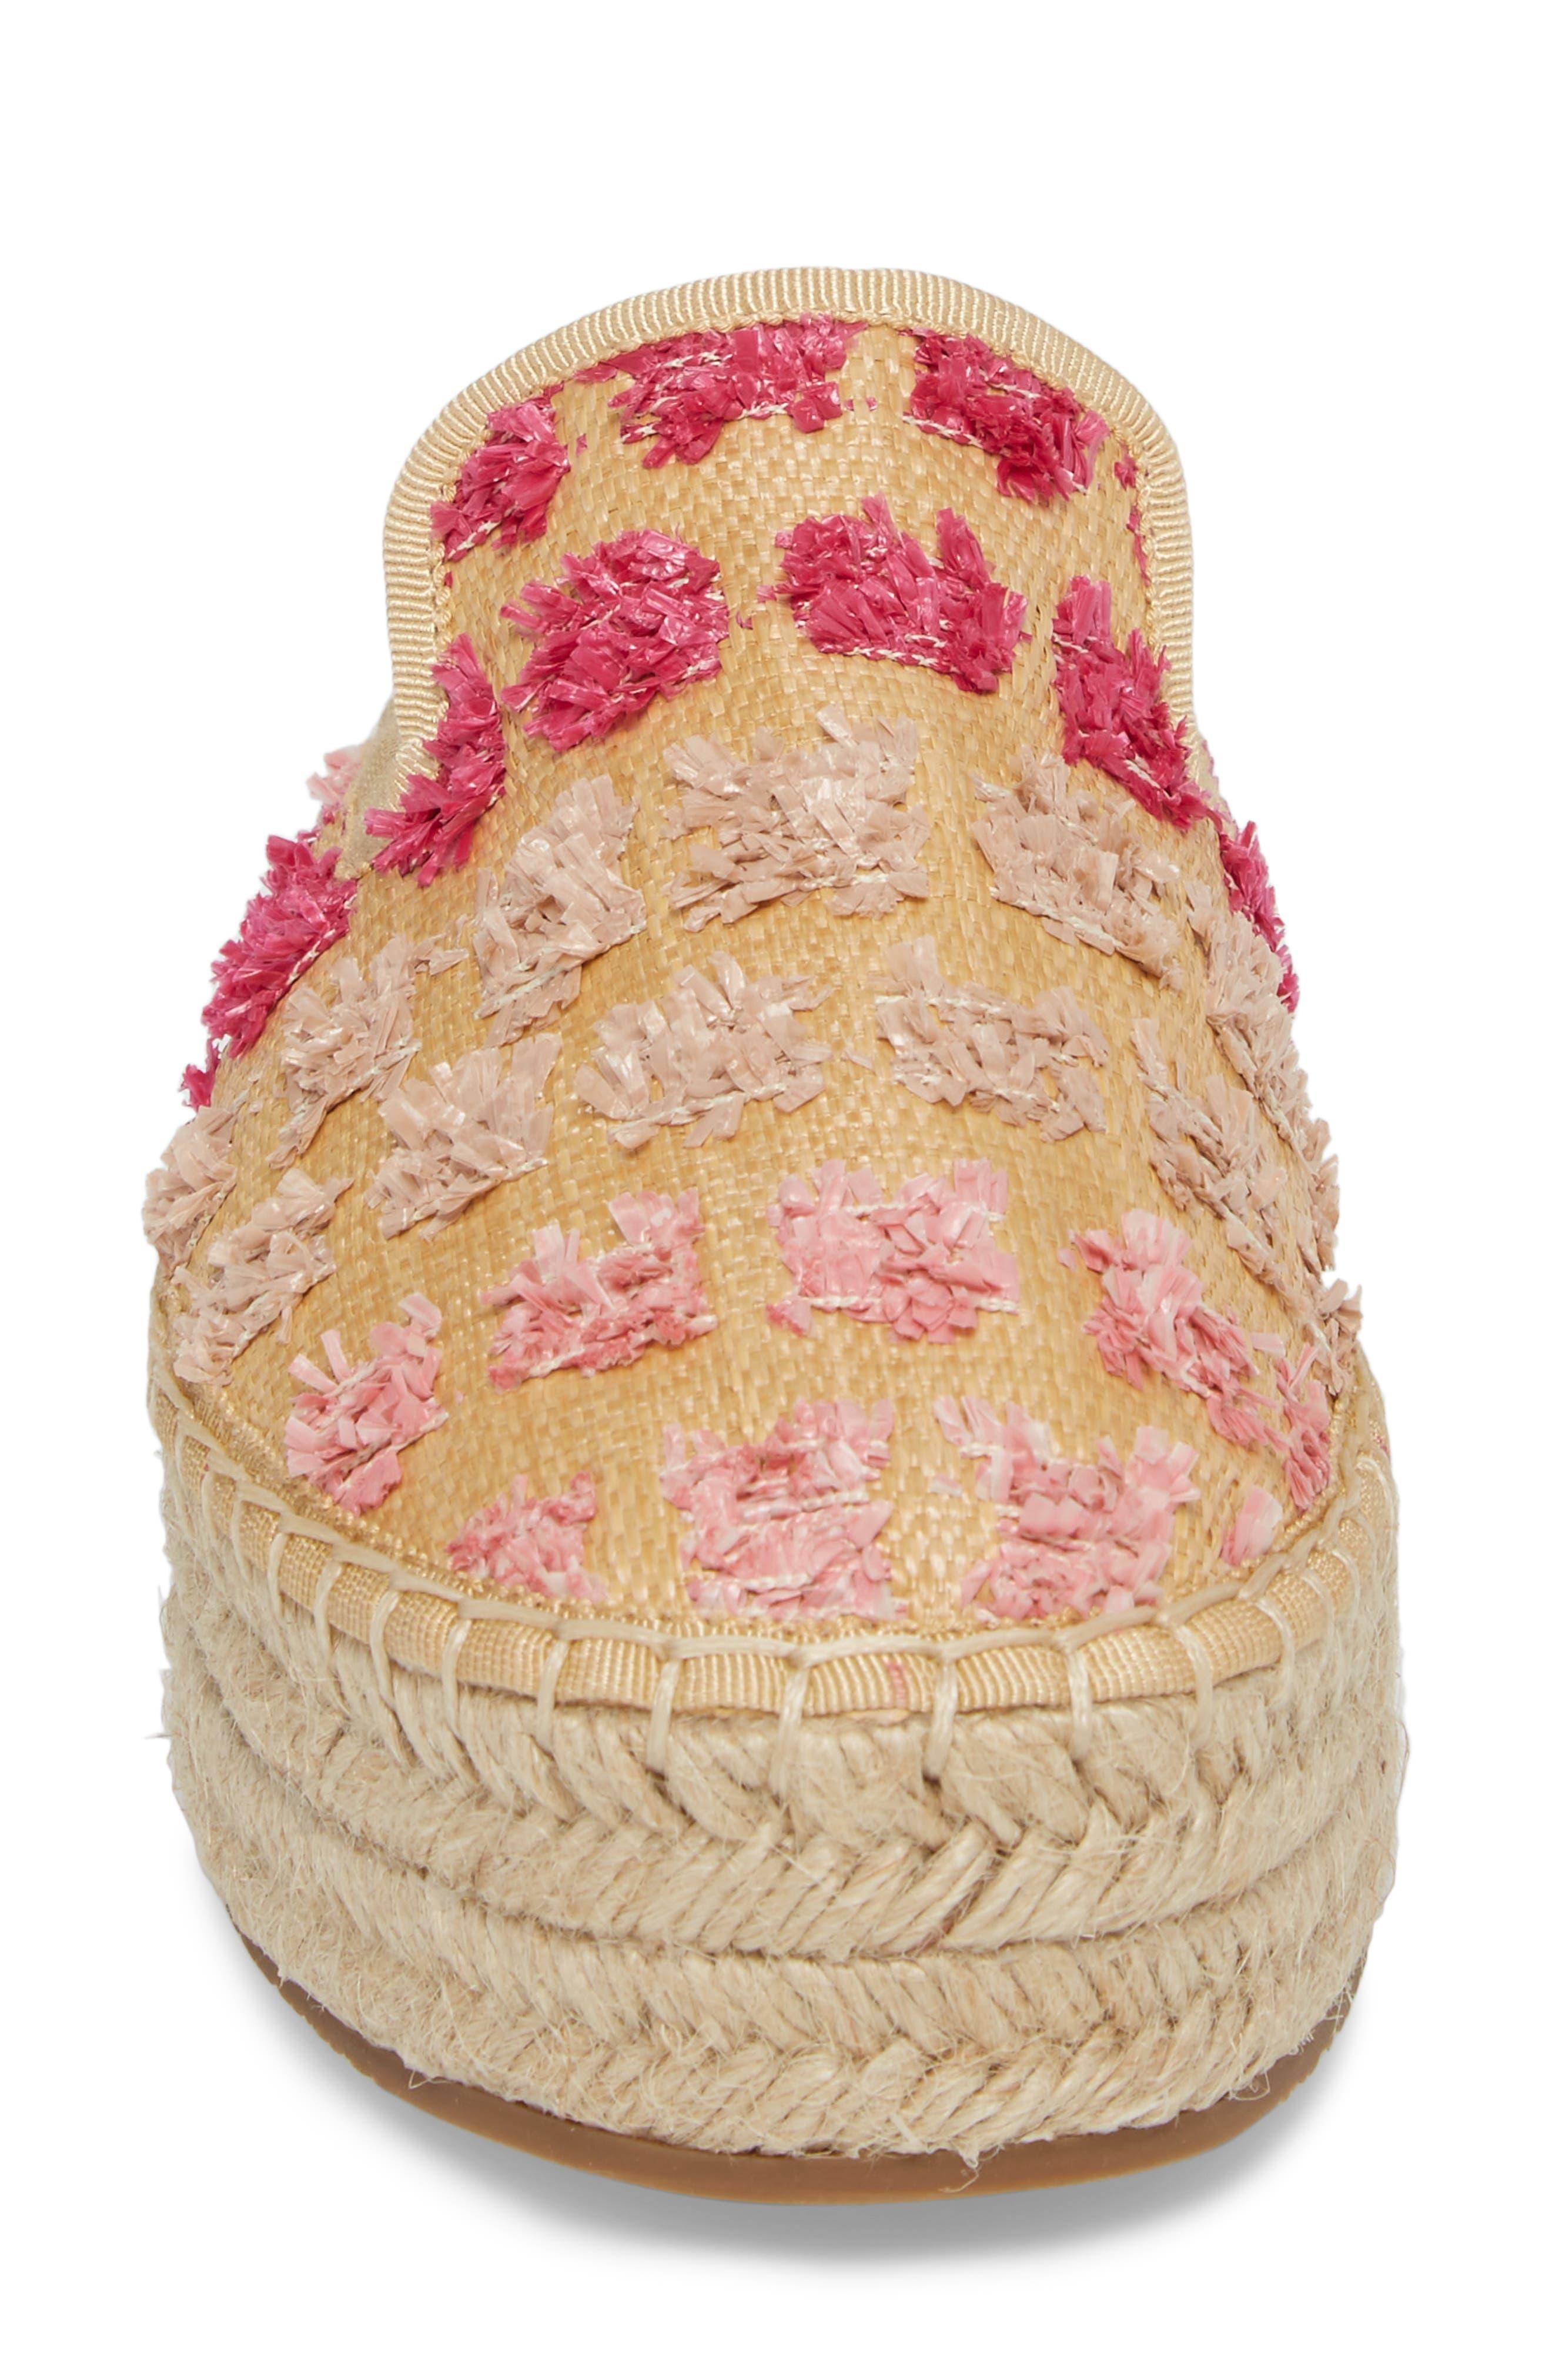 Marlowe Tufted Espadrille Loafer Mule,                             Alternate thumbnail 4, color,                             Pink Multi Faux Raffia